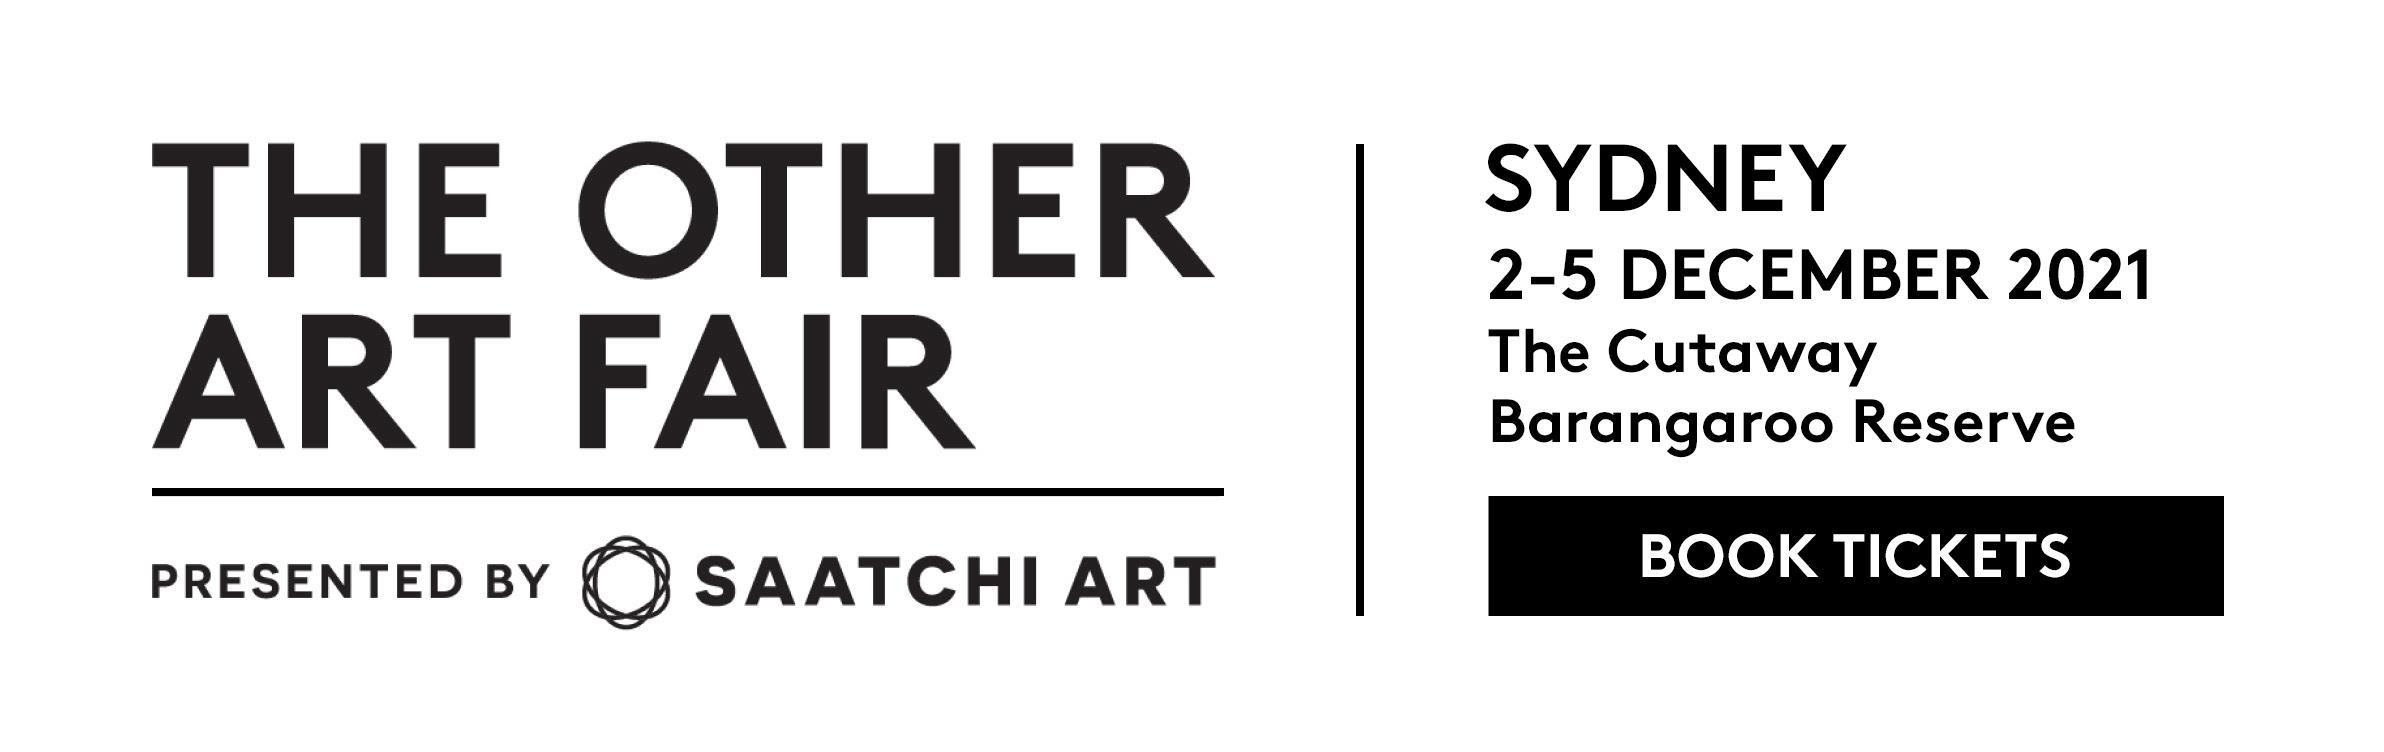 The Other Art Fair presented by Saatchi Art Sydney 2-5 December, 2021 Barangaroo Reserve BOOK TICKETS